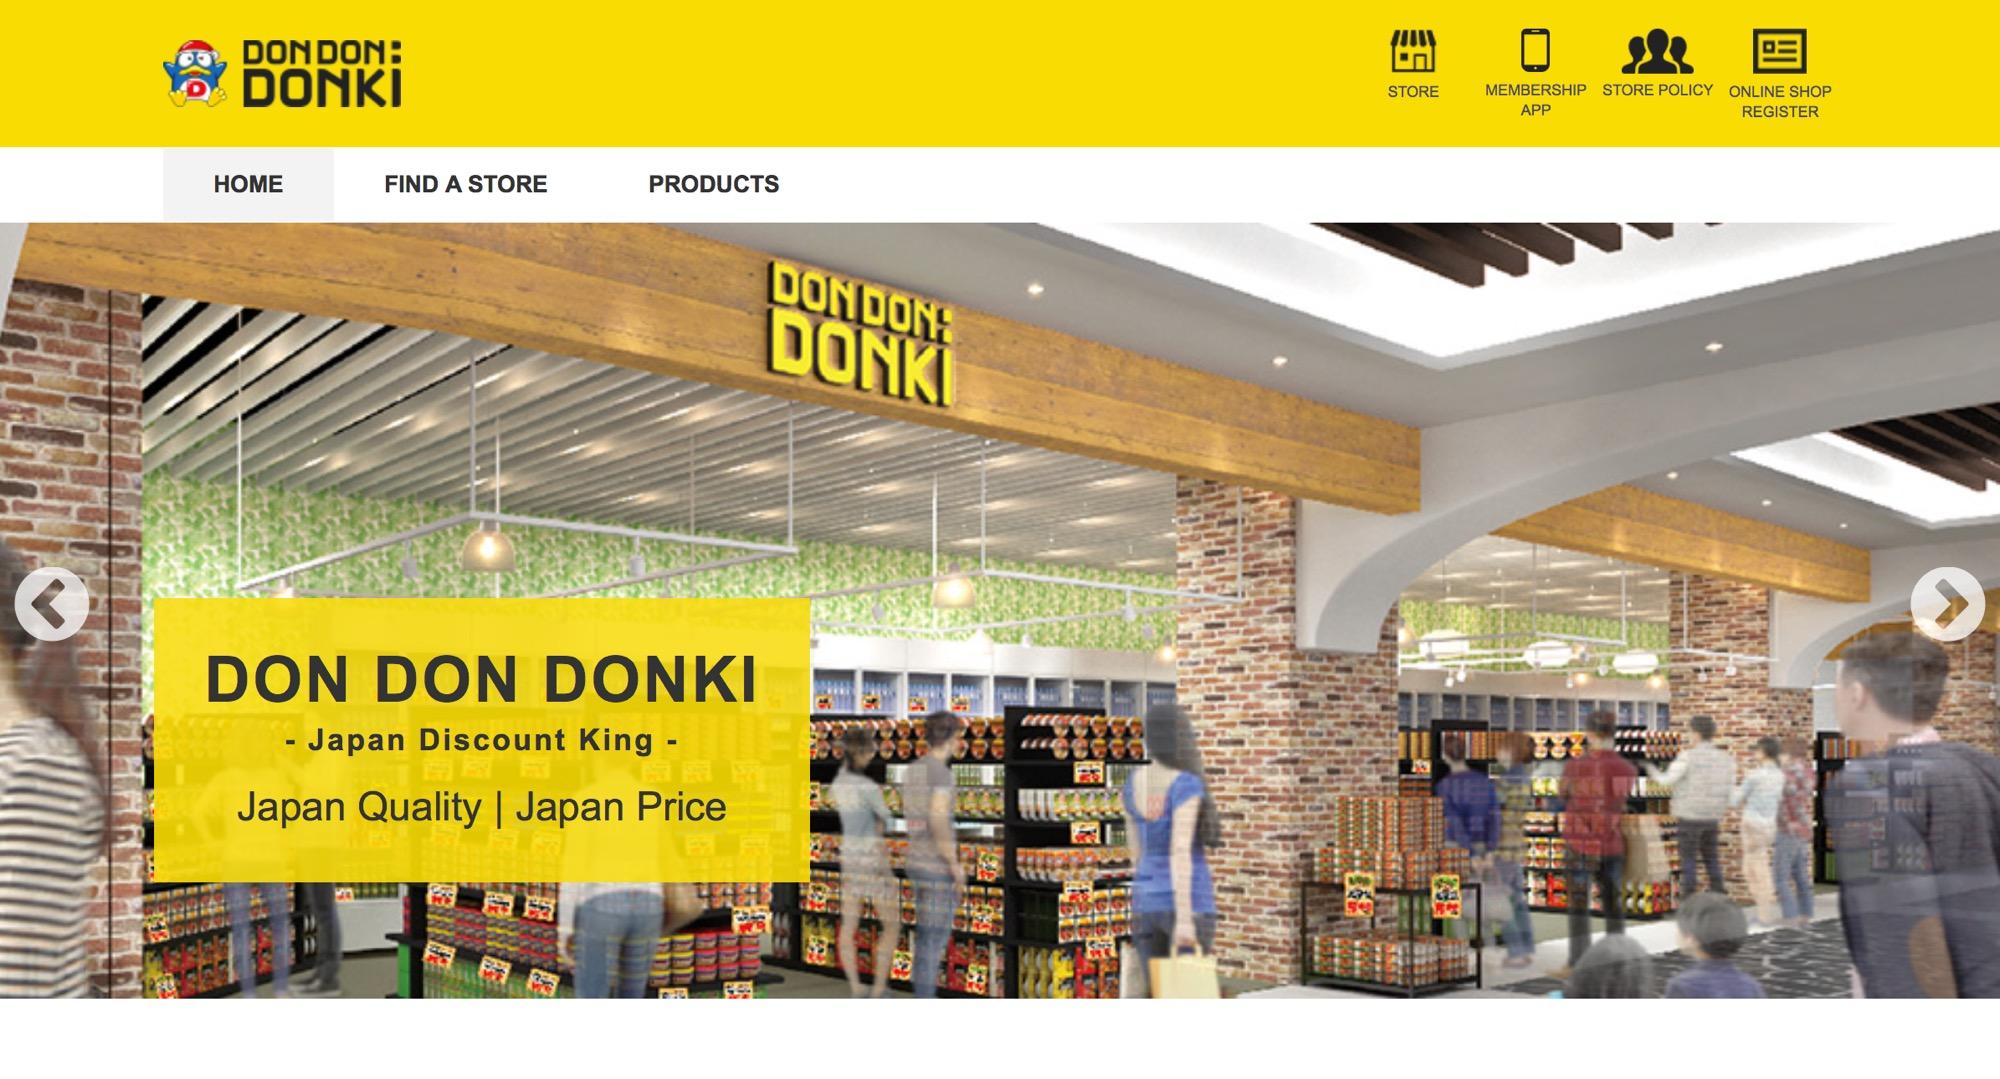 DON DON DONKI Orchard Central(ドンキ オーチャードセントラル店)が12月1日オープン!